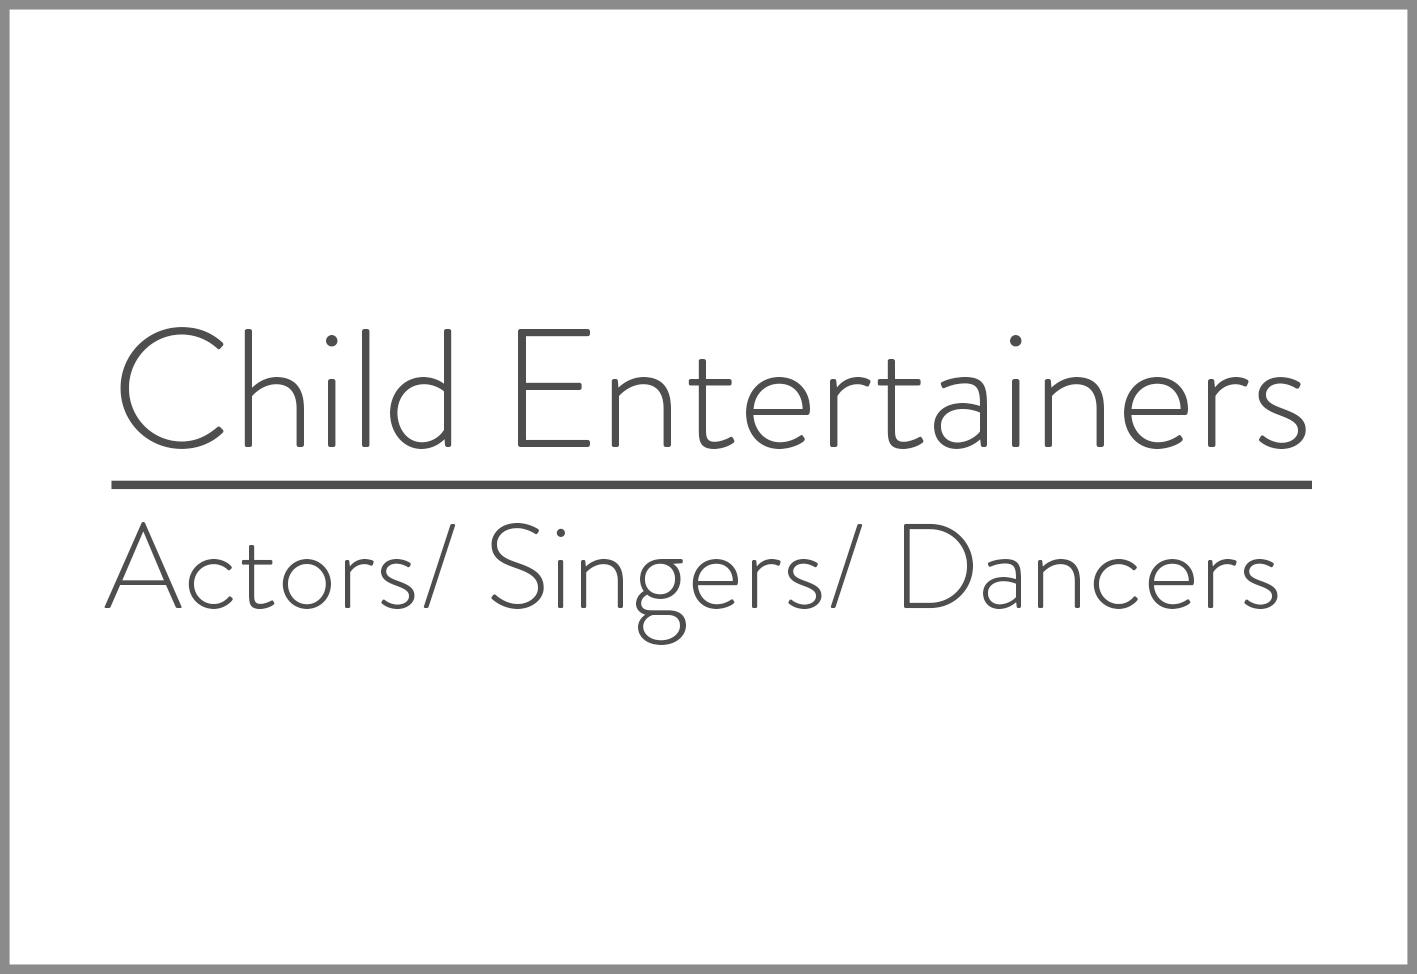 Child entertainers.jpg